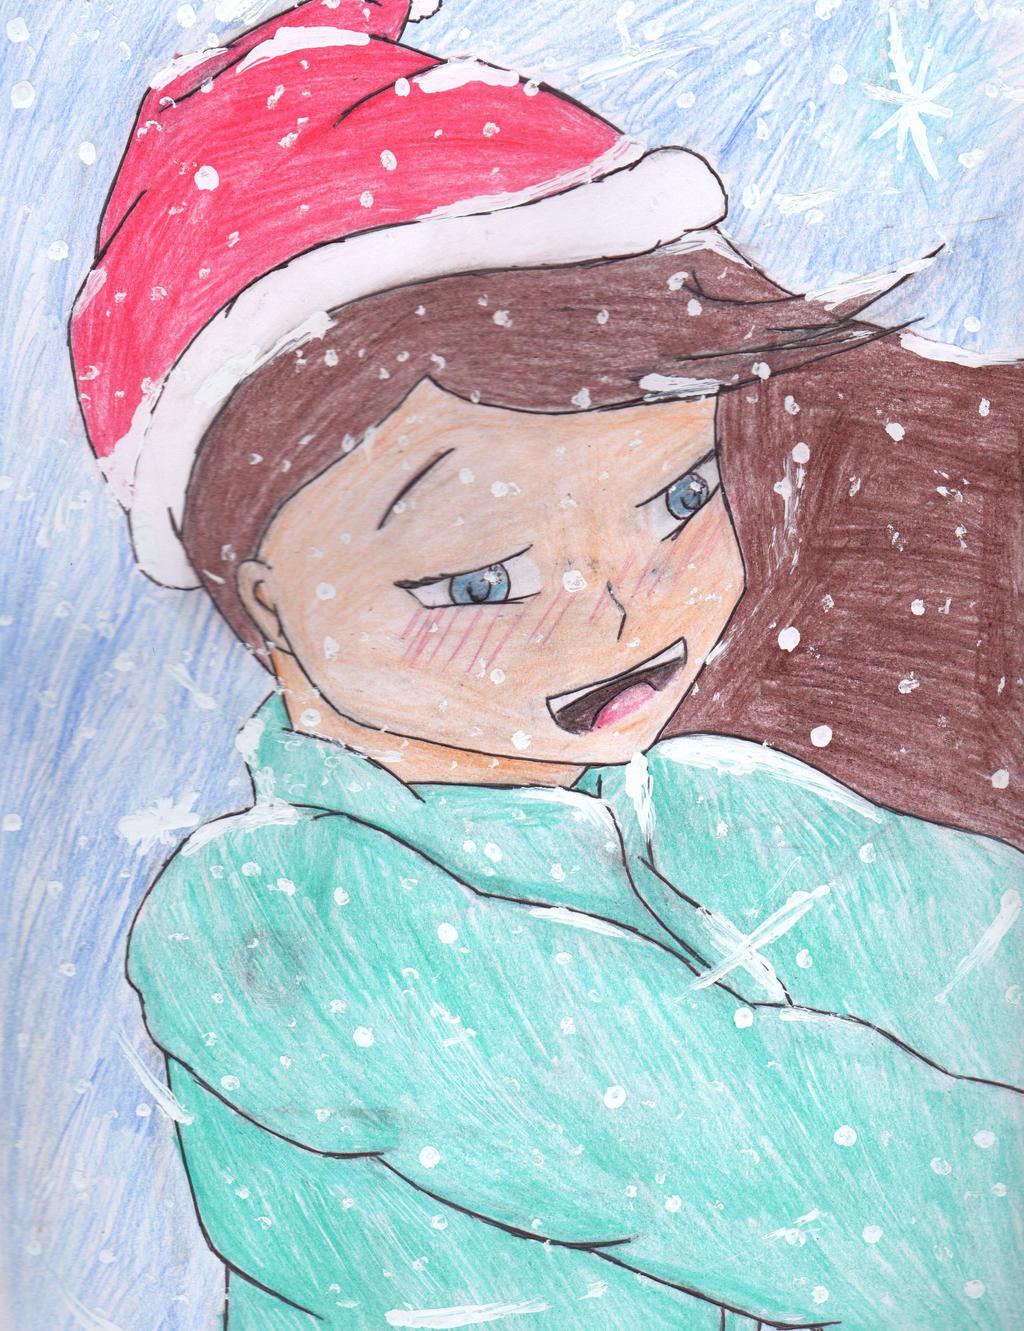 Snow Storm by Ahtilak